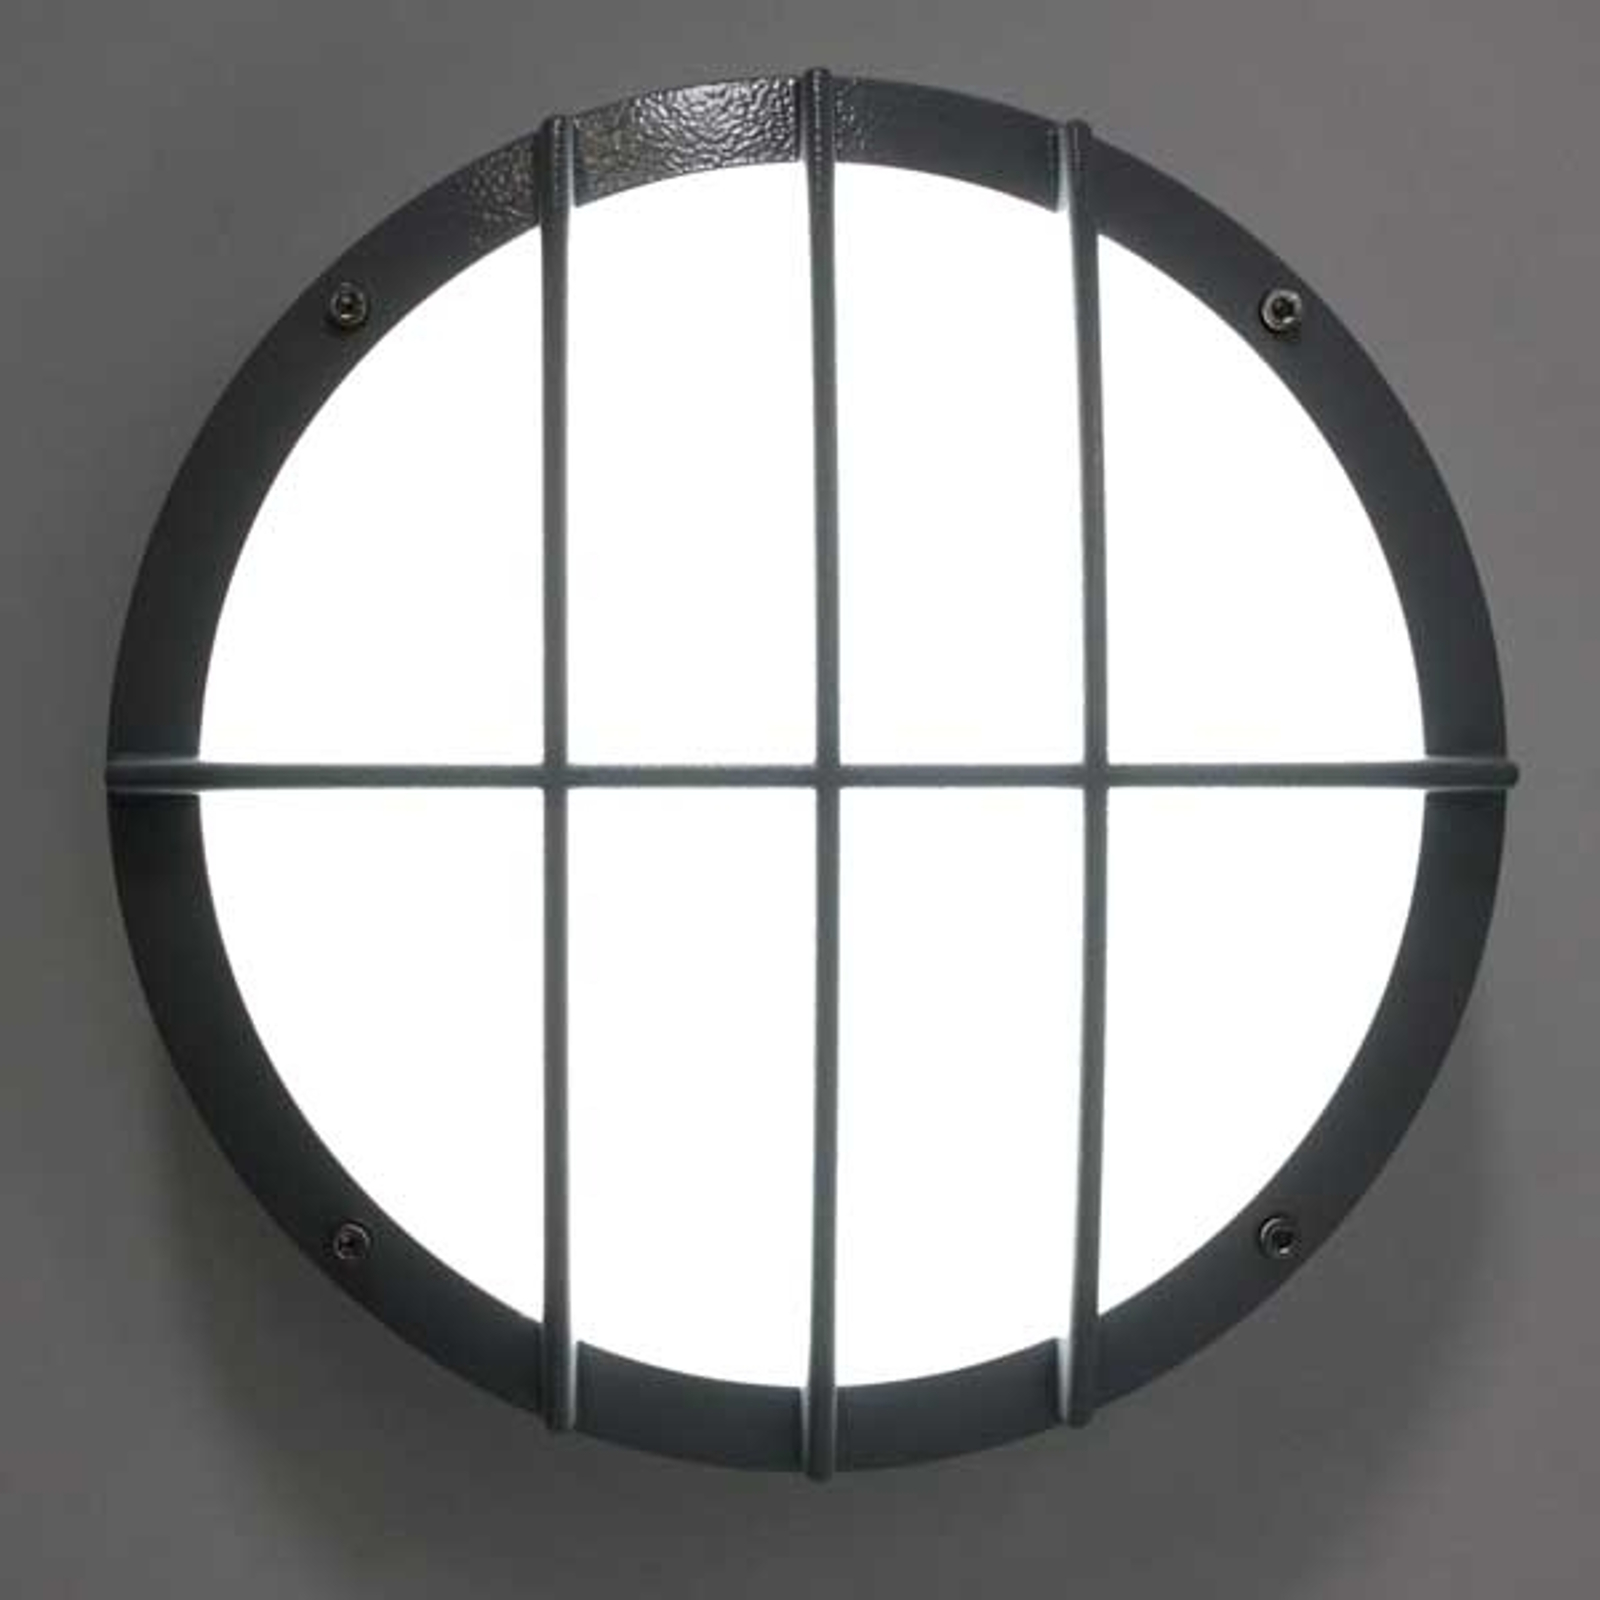 LED-Wandleuchte Sun 8 LED Sensor, 4.000K